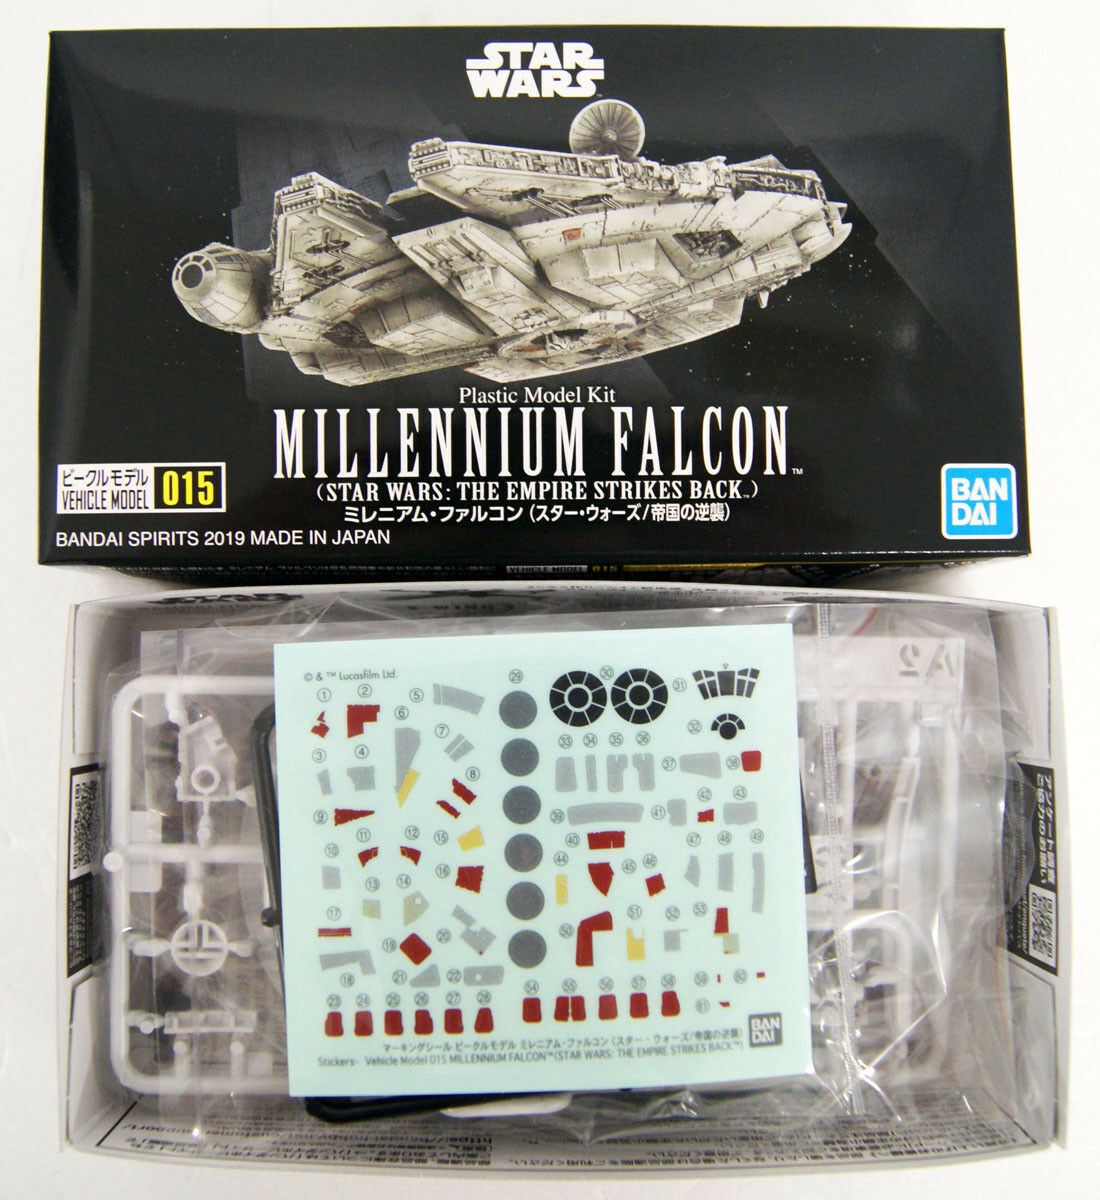 Bandai 5055704 Vehicle Model 015 Millennium Falcon (Empire Strikes Back) Kit